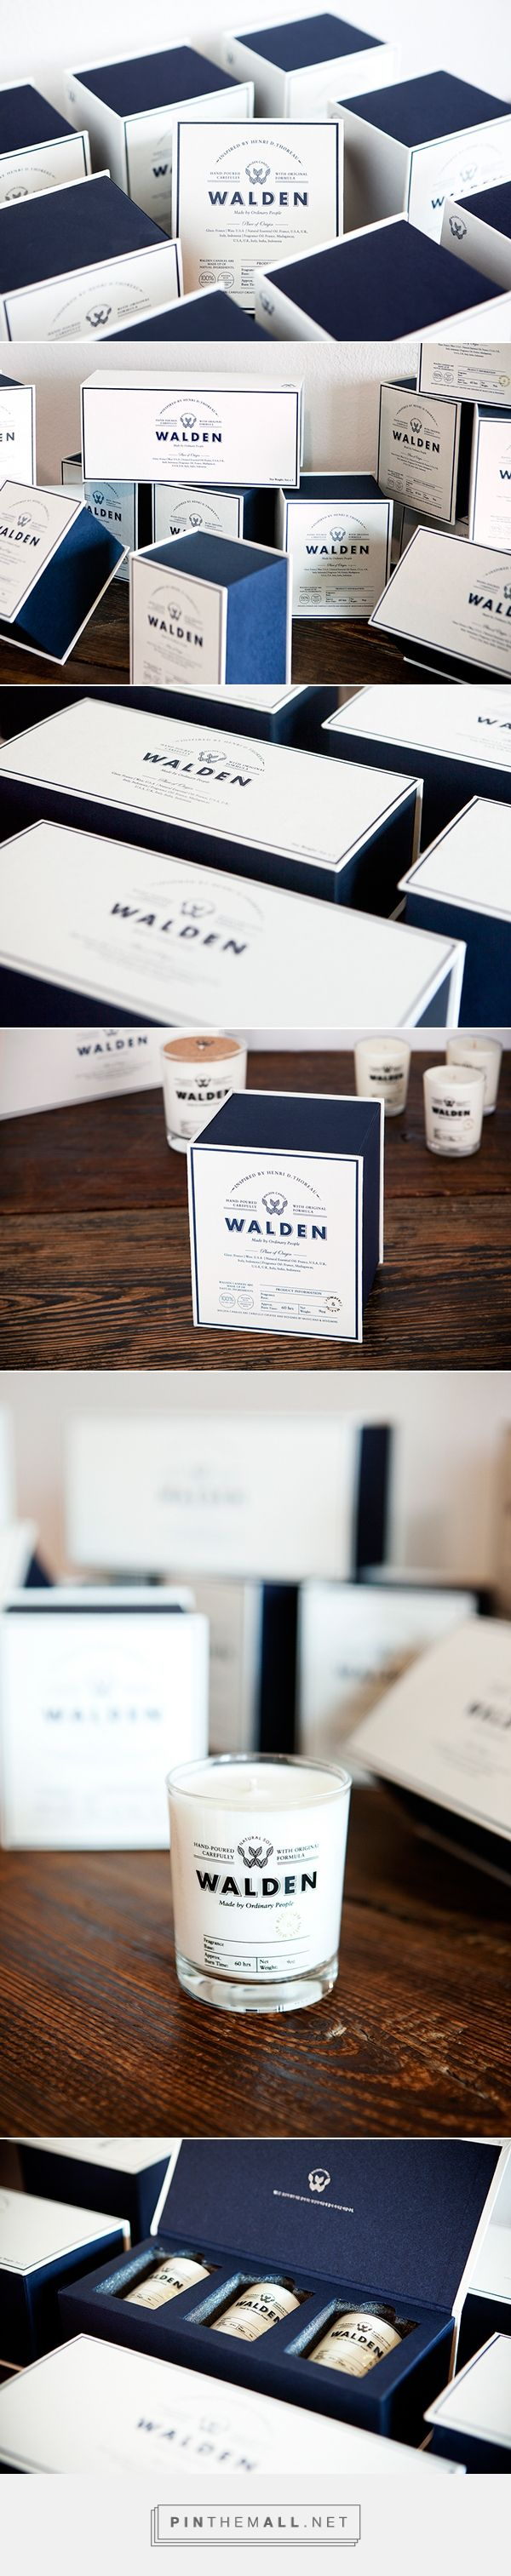 WALDEN - natural soy candle brand based in Korea